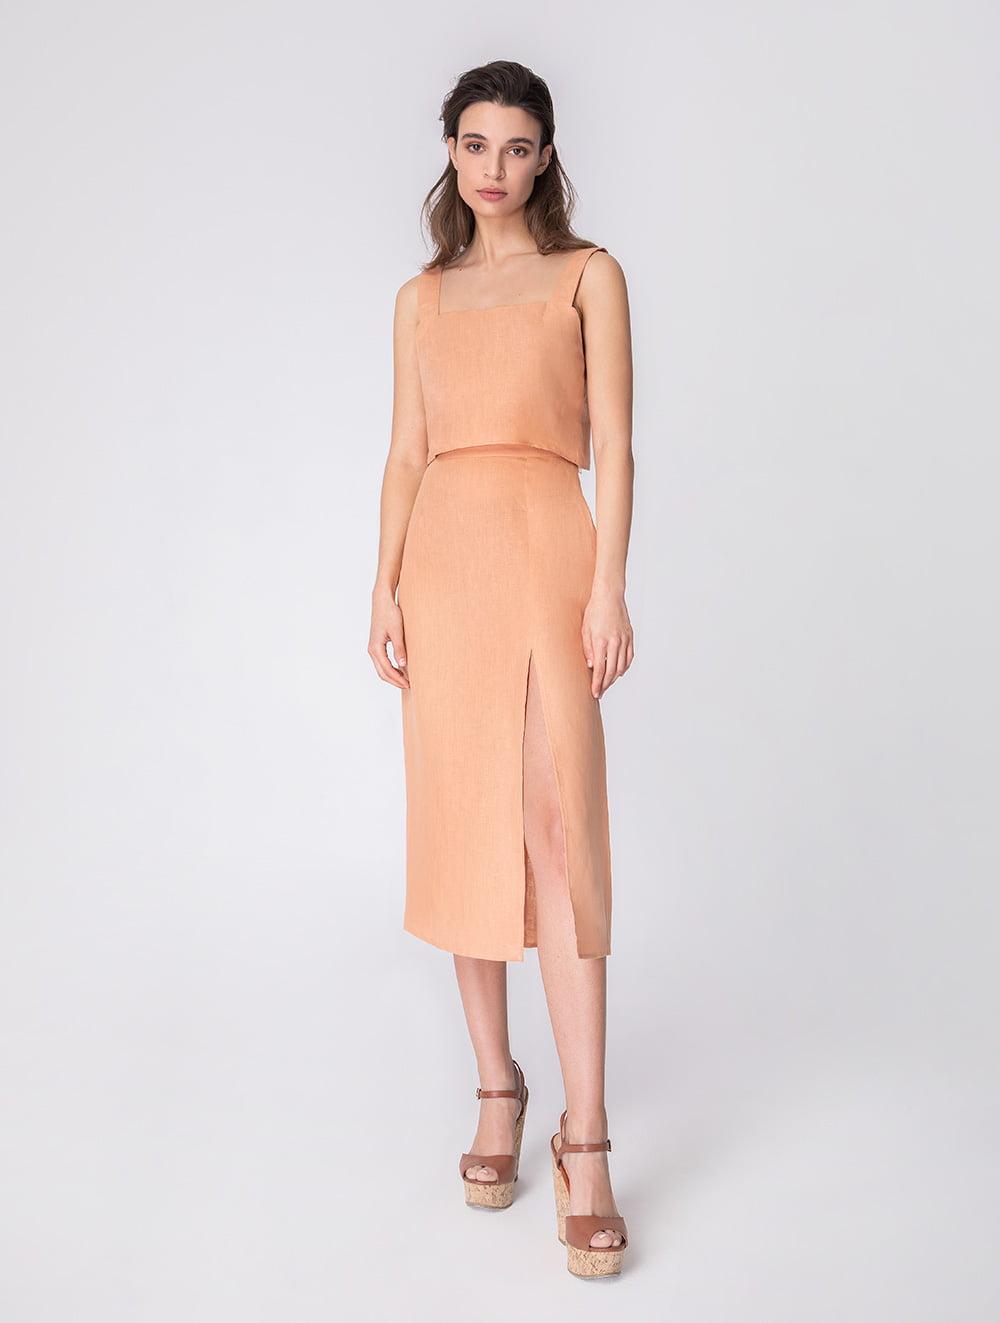 Chrysanthe skirt